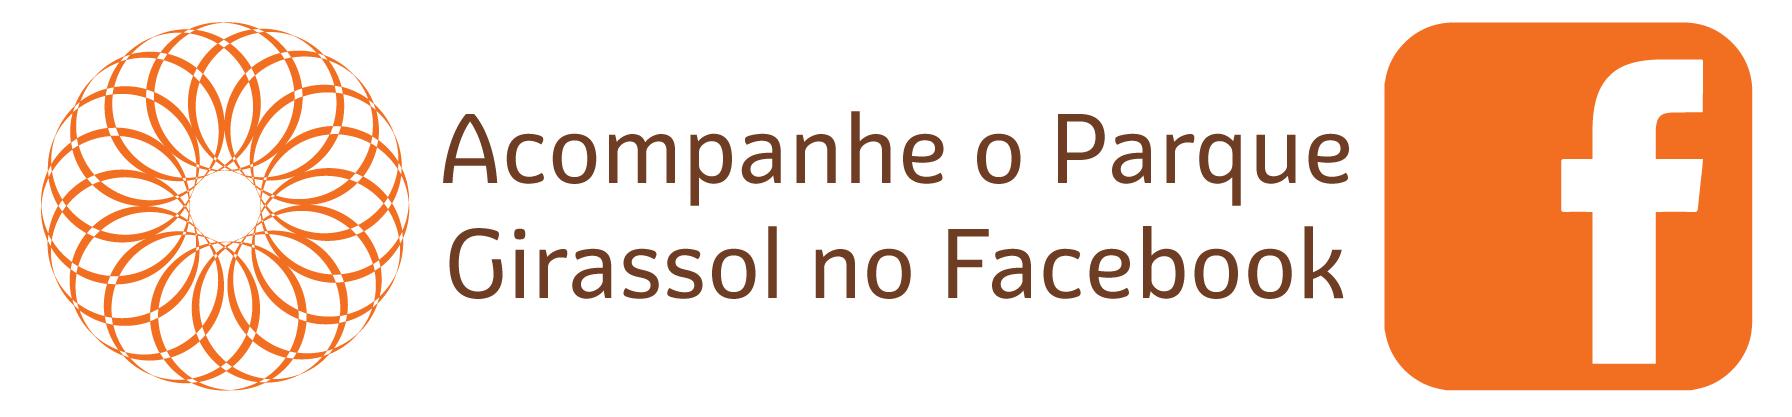 girassol face-01